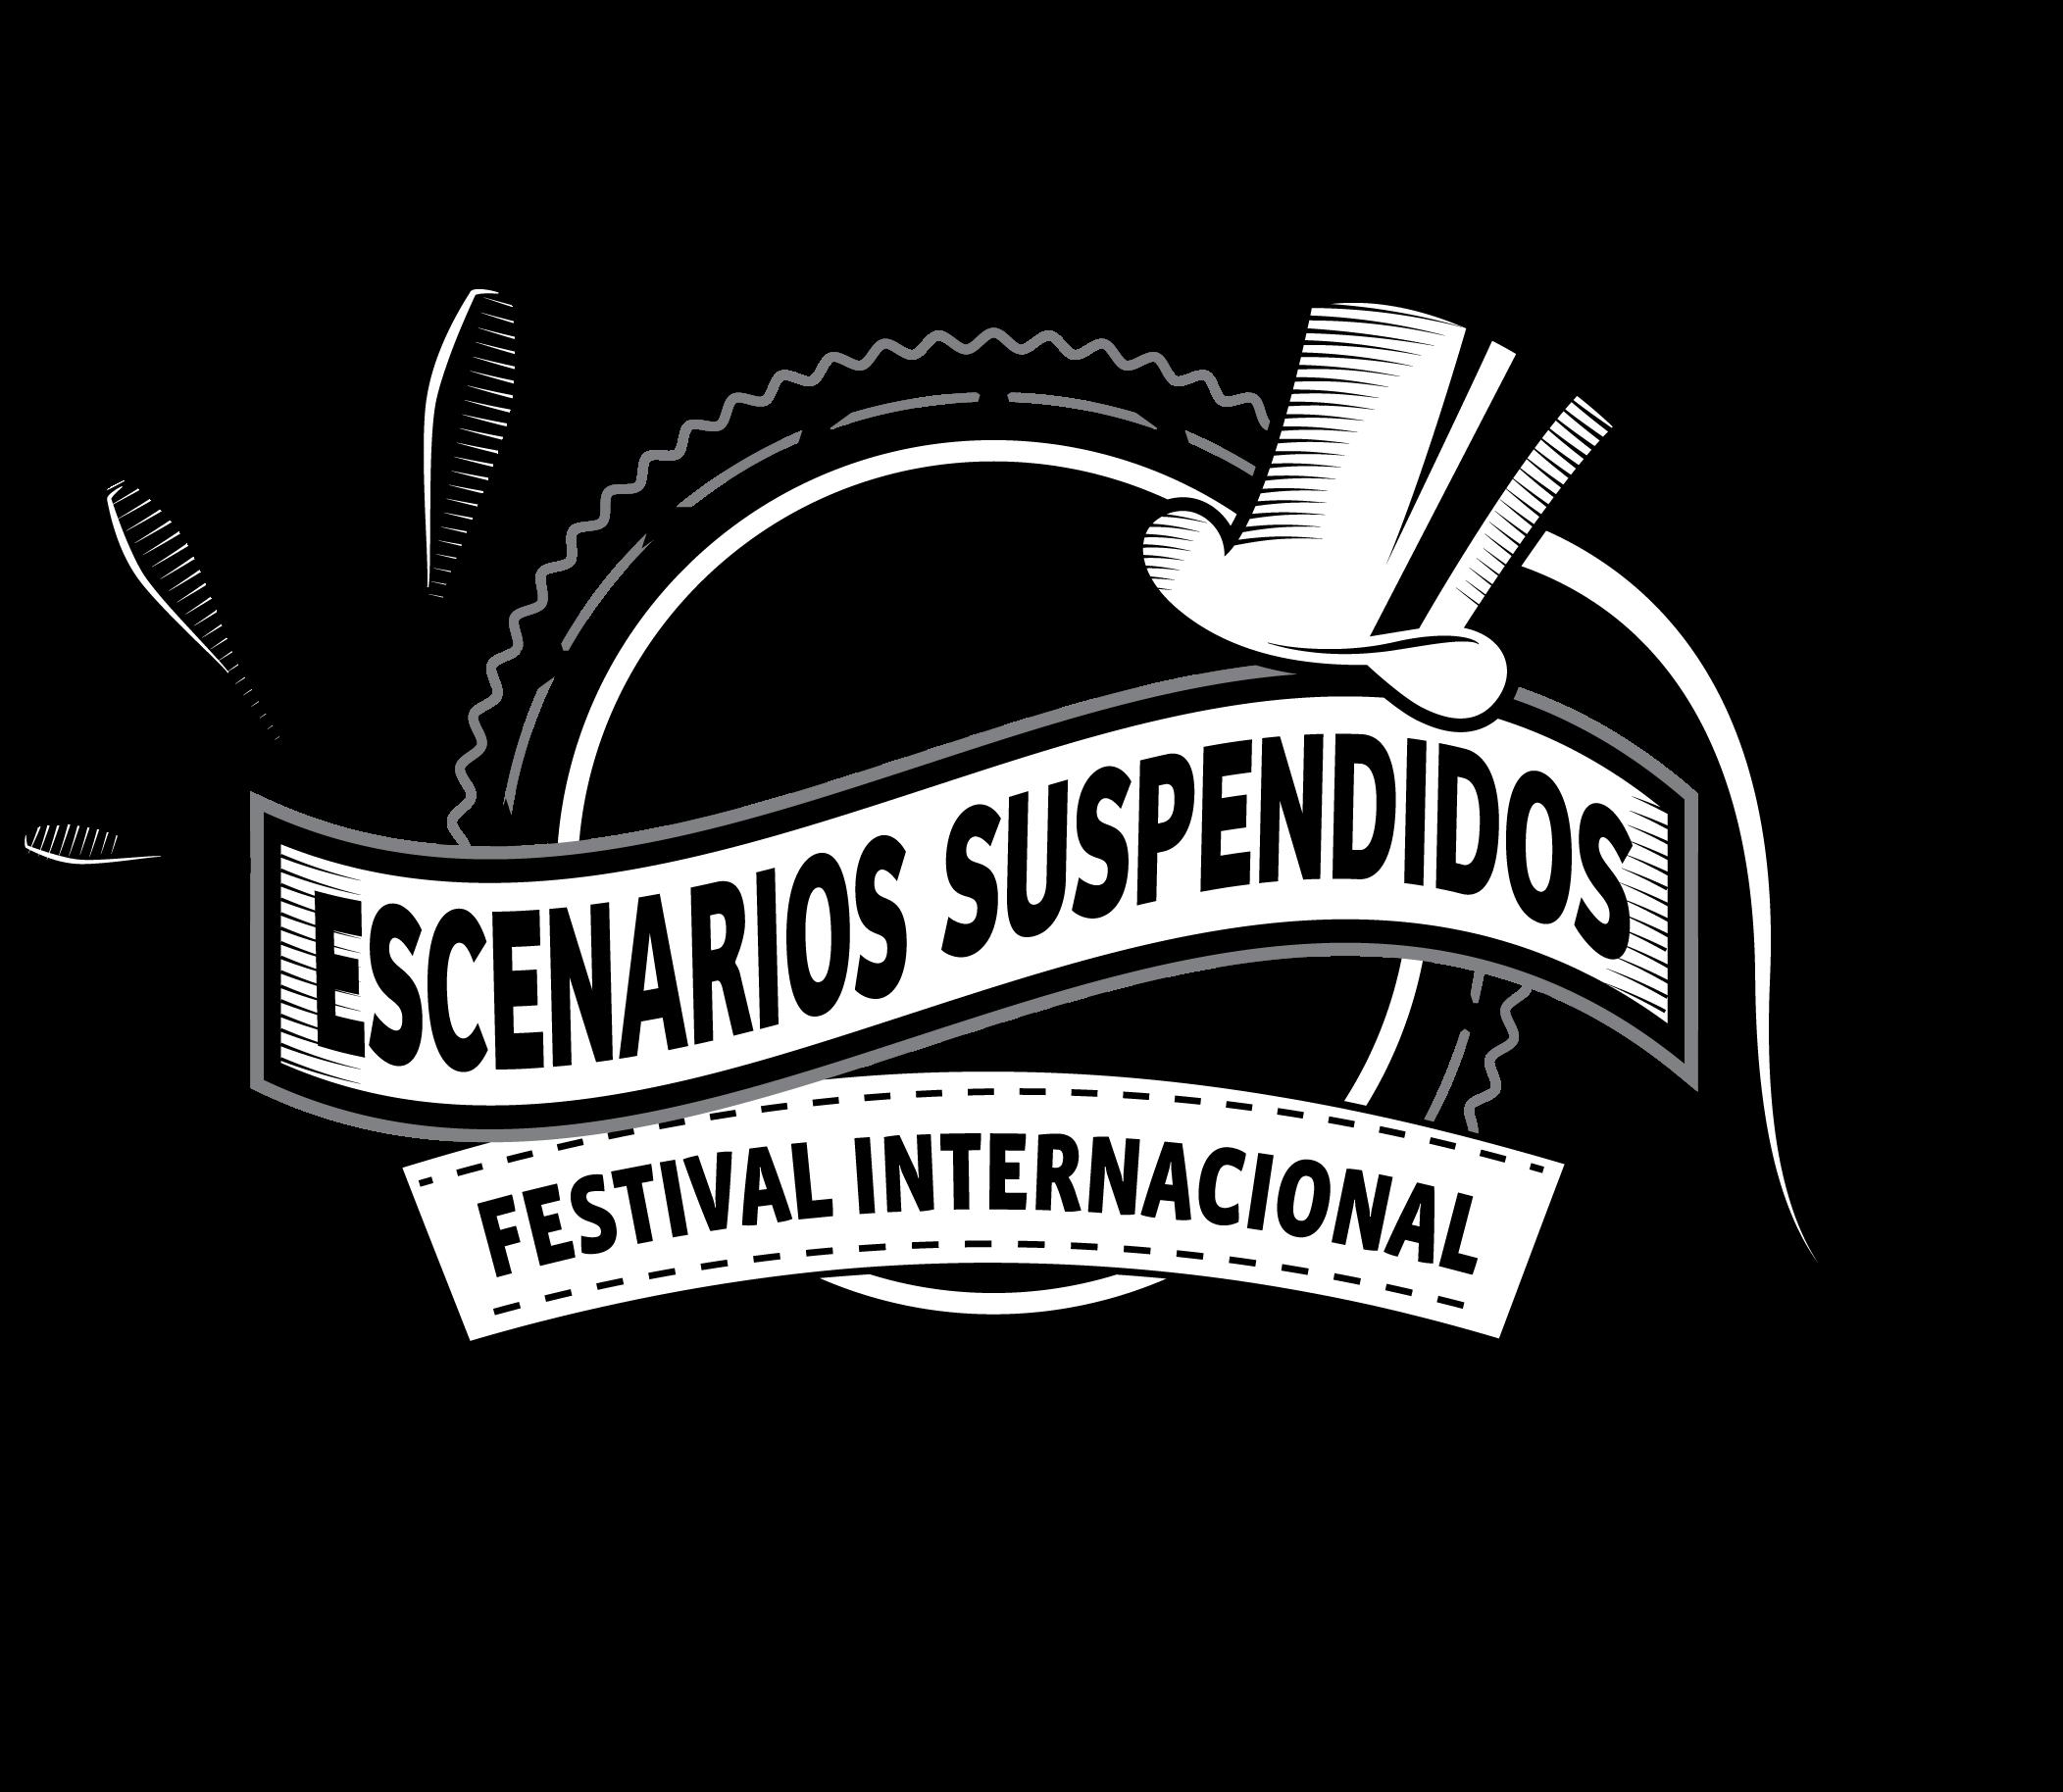 FESTIVAL INTERNACIONAL ESCENARIOS SUSPENDIDOS - Circus Events - CircusTalk